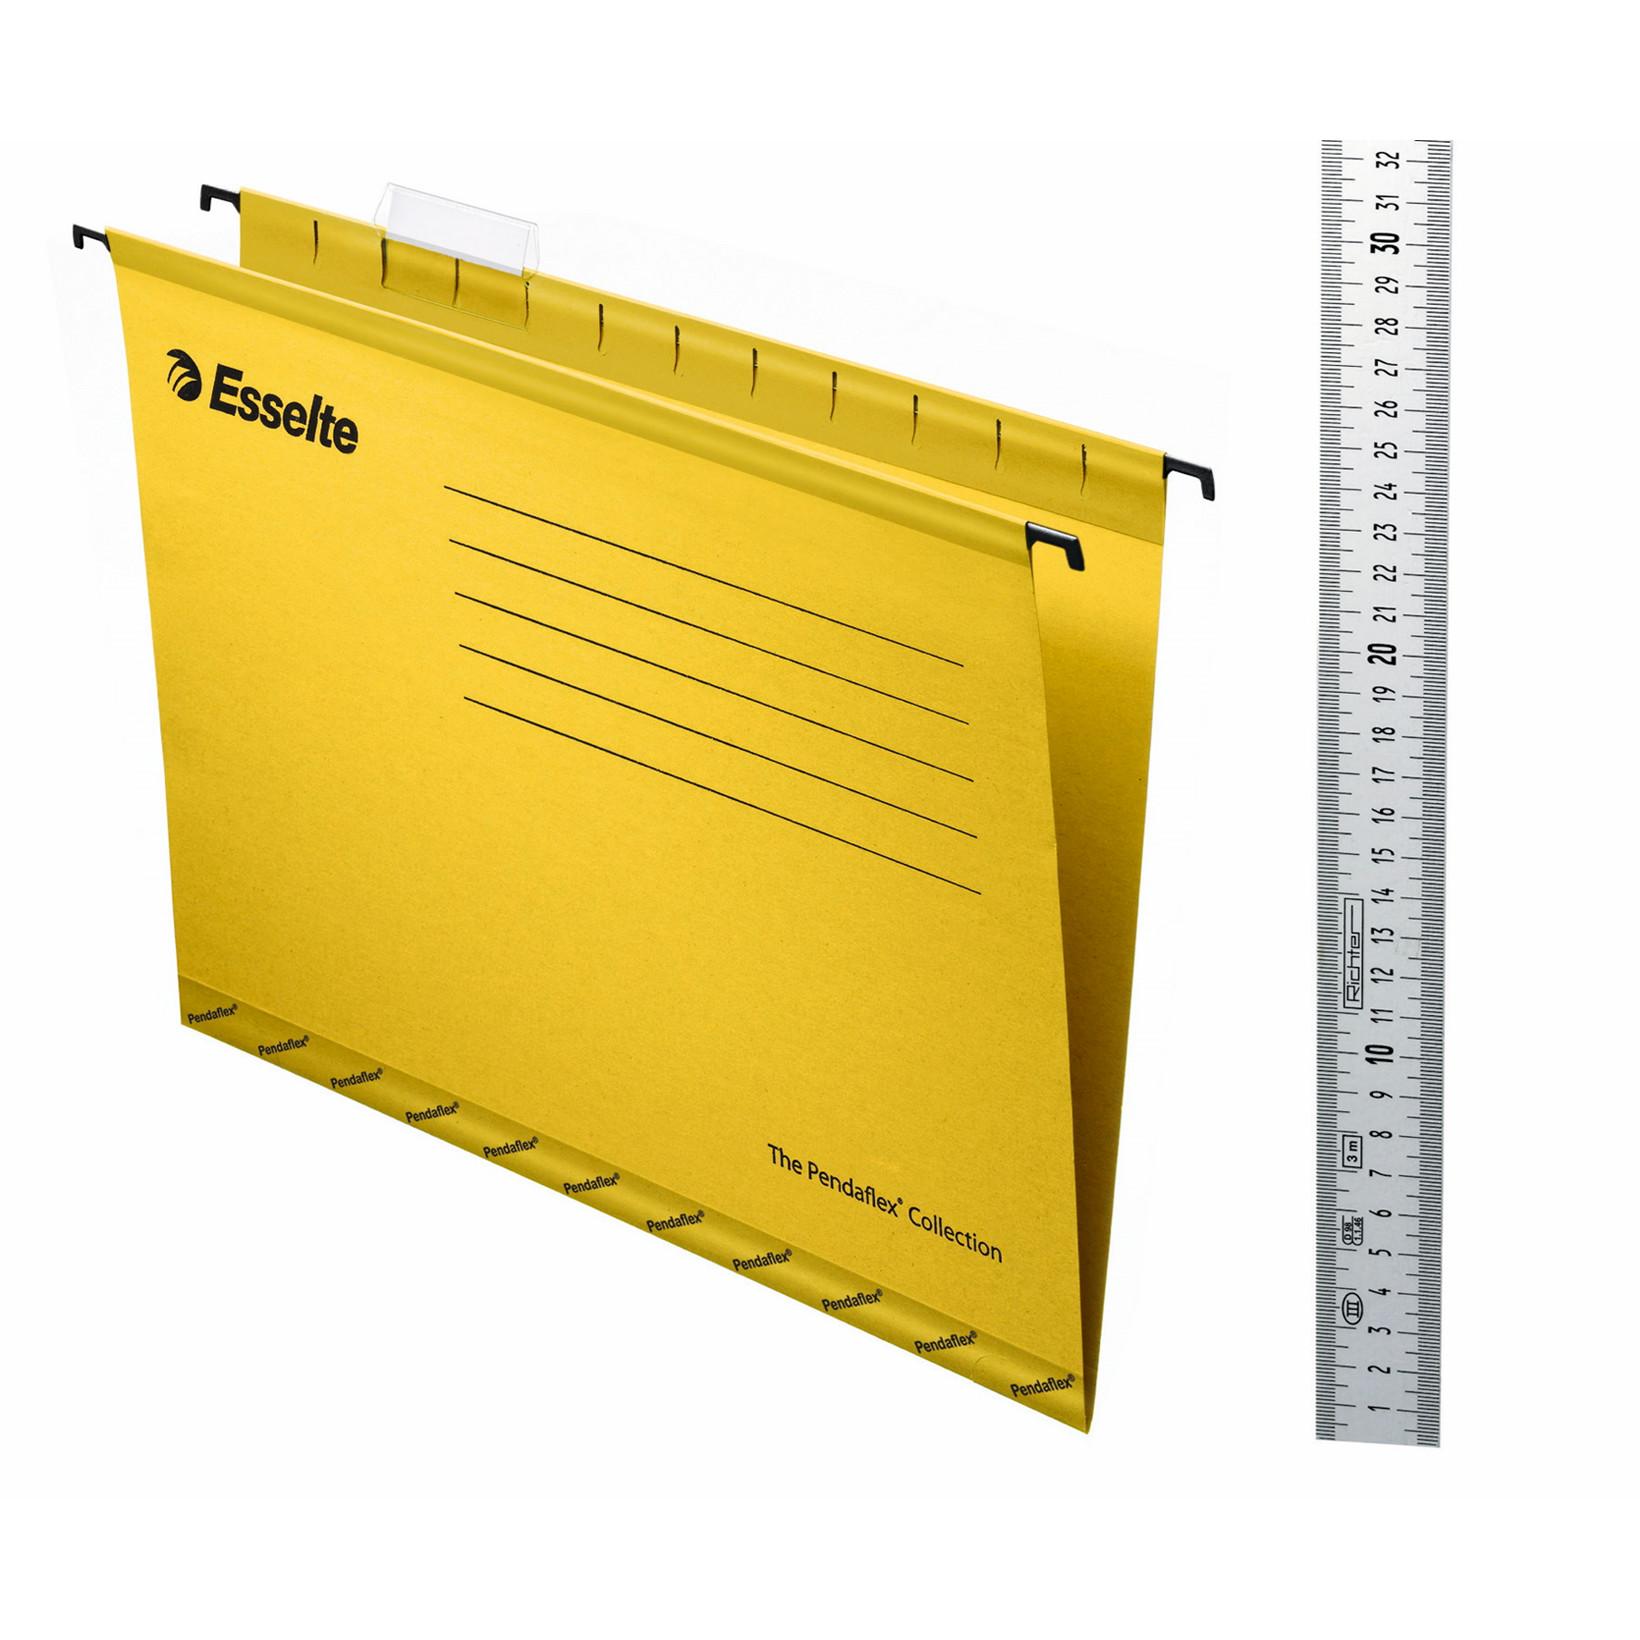 Hængemapper A4 gul - 25 stk. pr. pakke